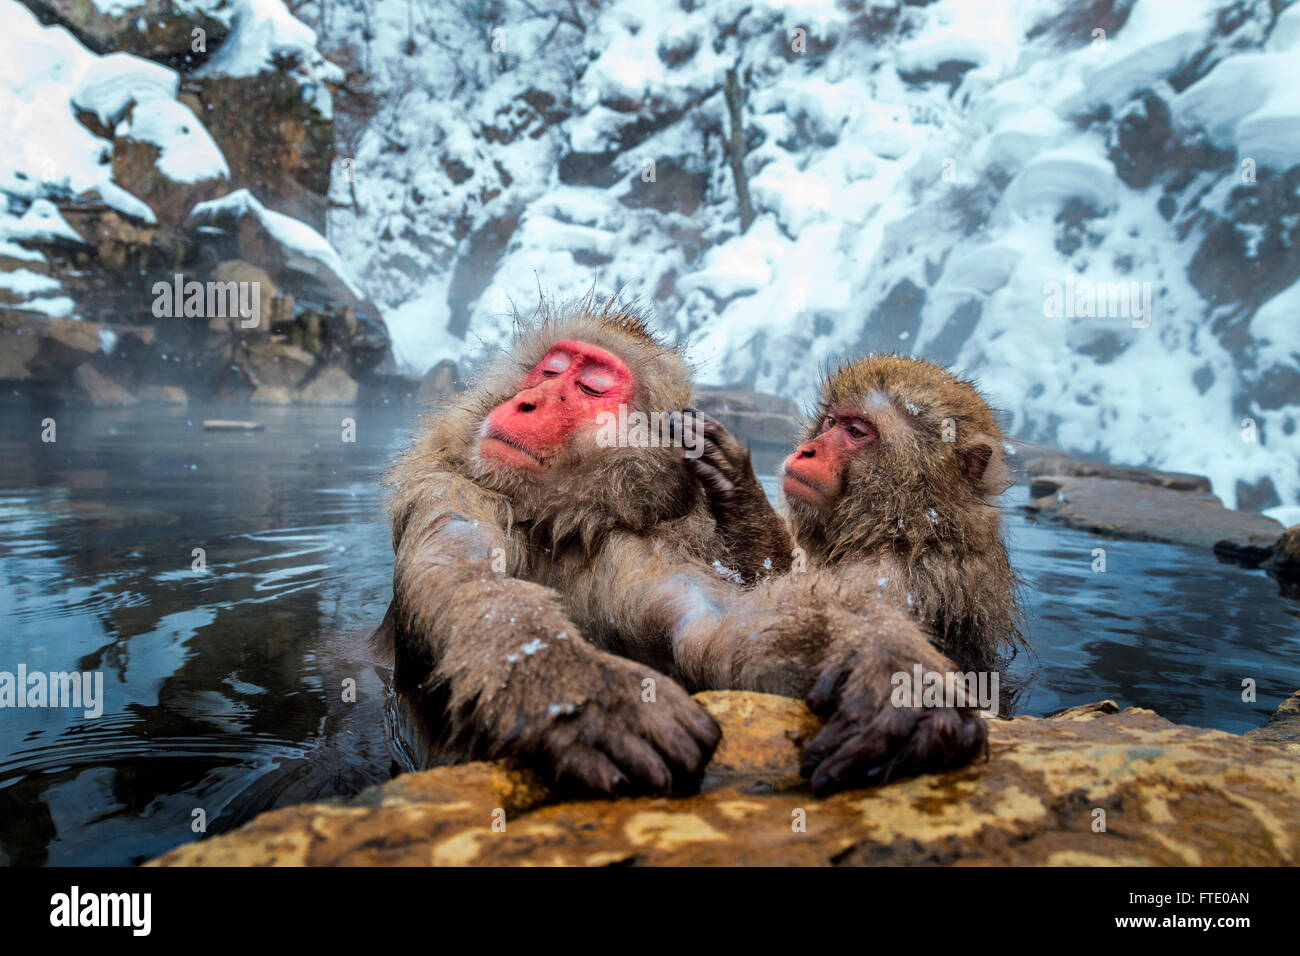 Neve scimmie grooming Jigokudani a caldo molla, Giappone. Immagini Stock